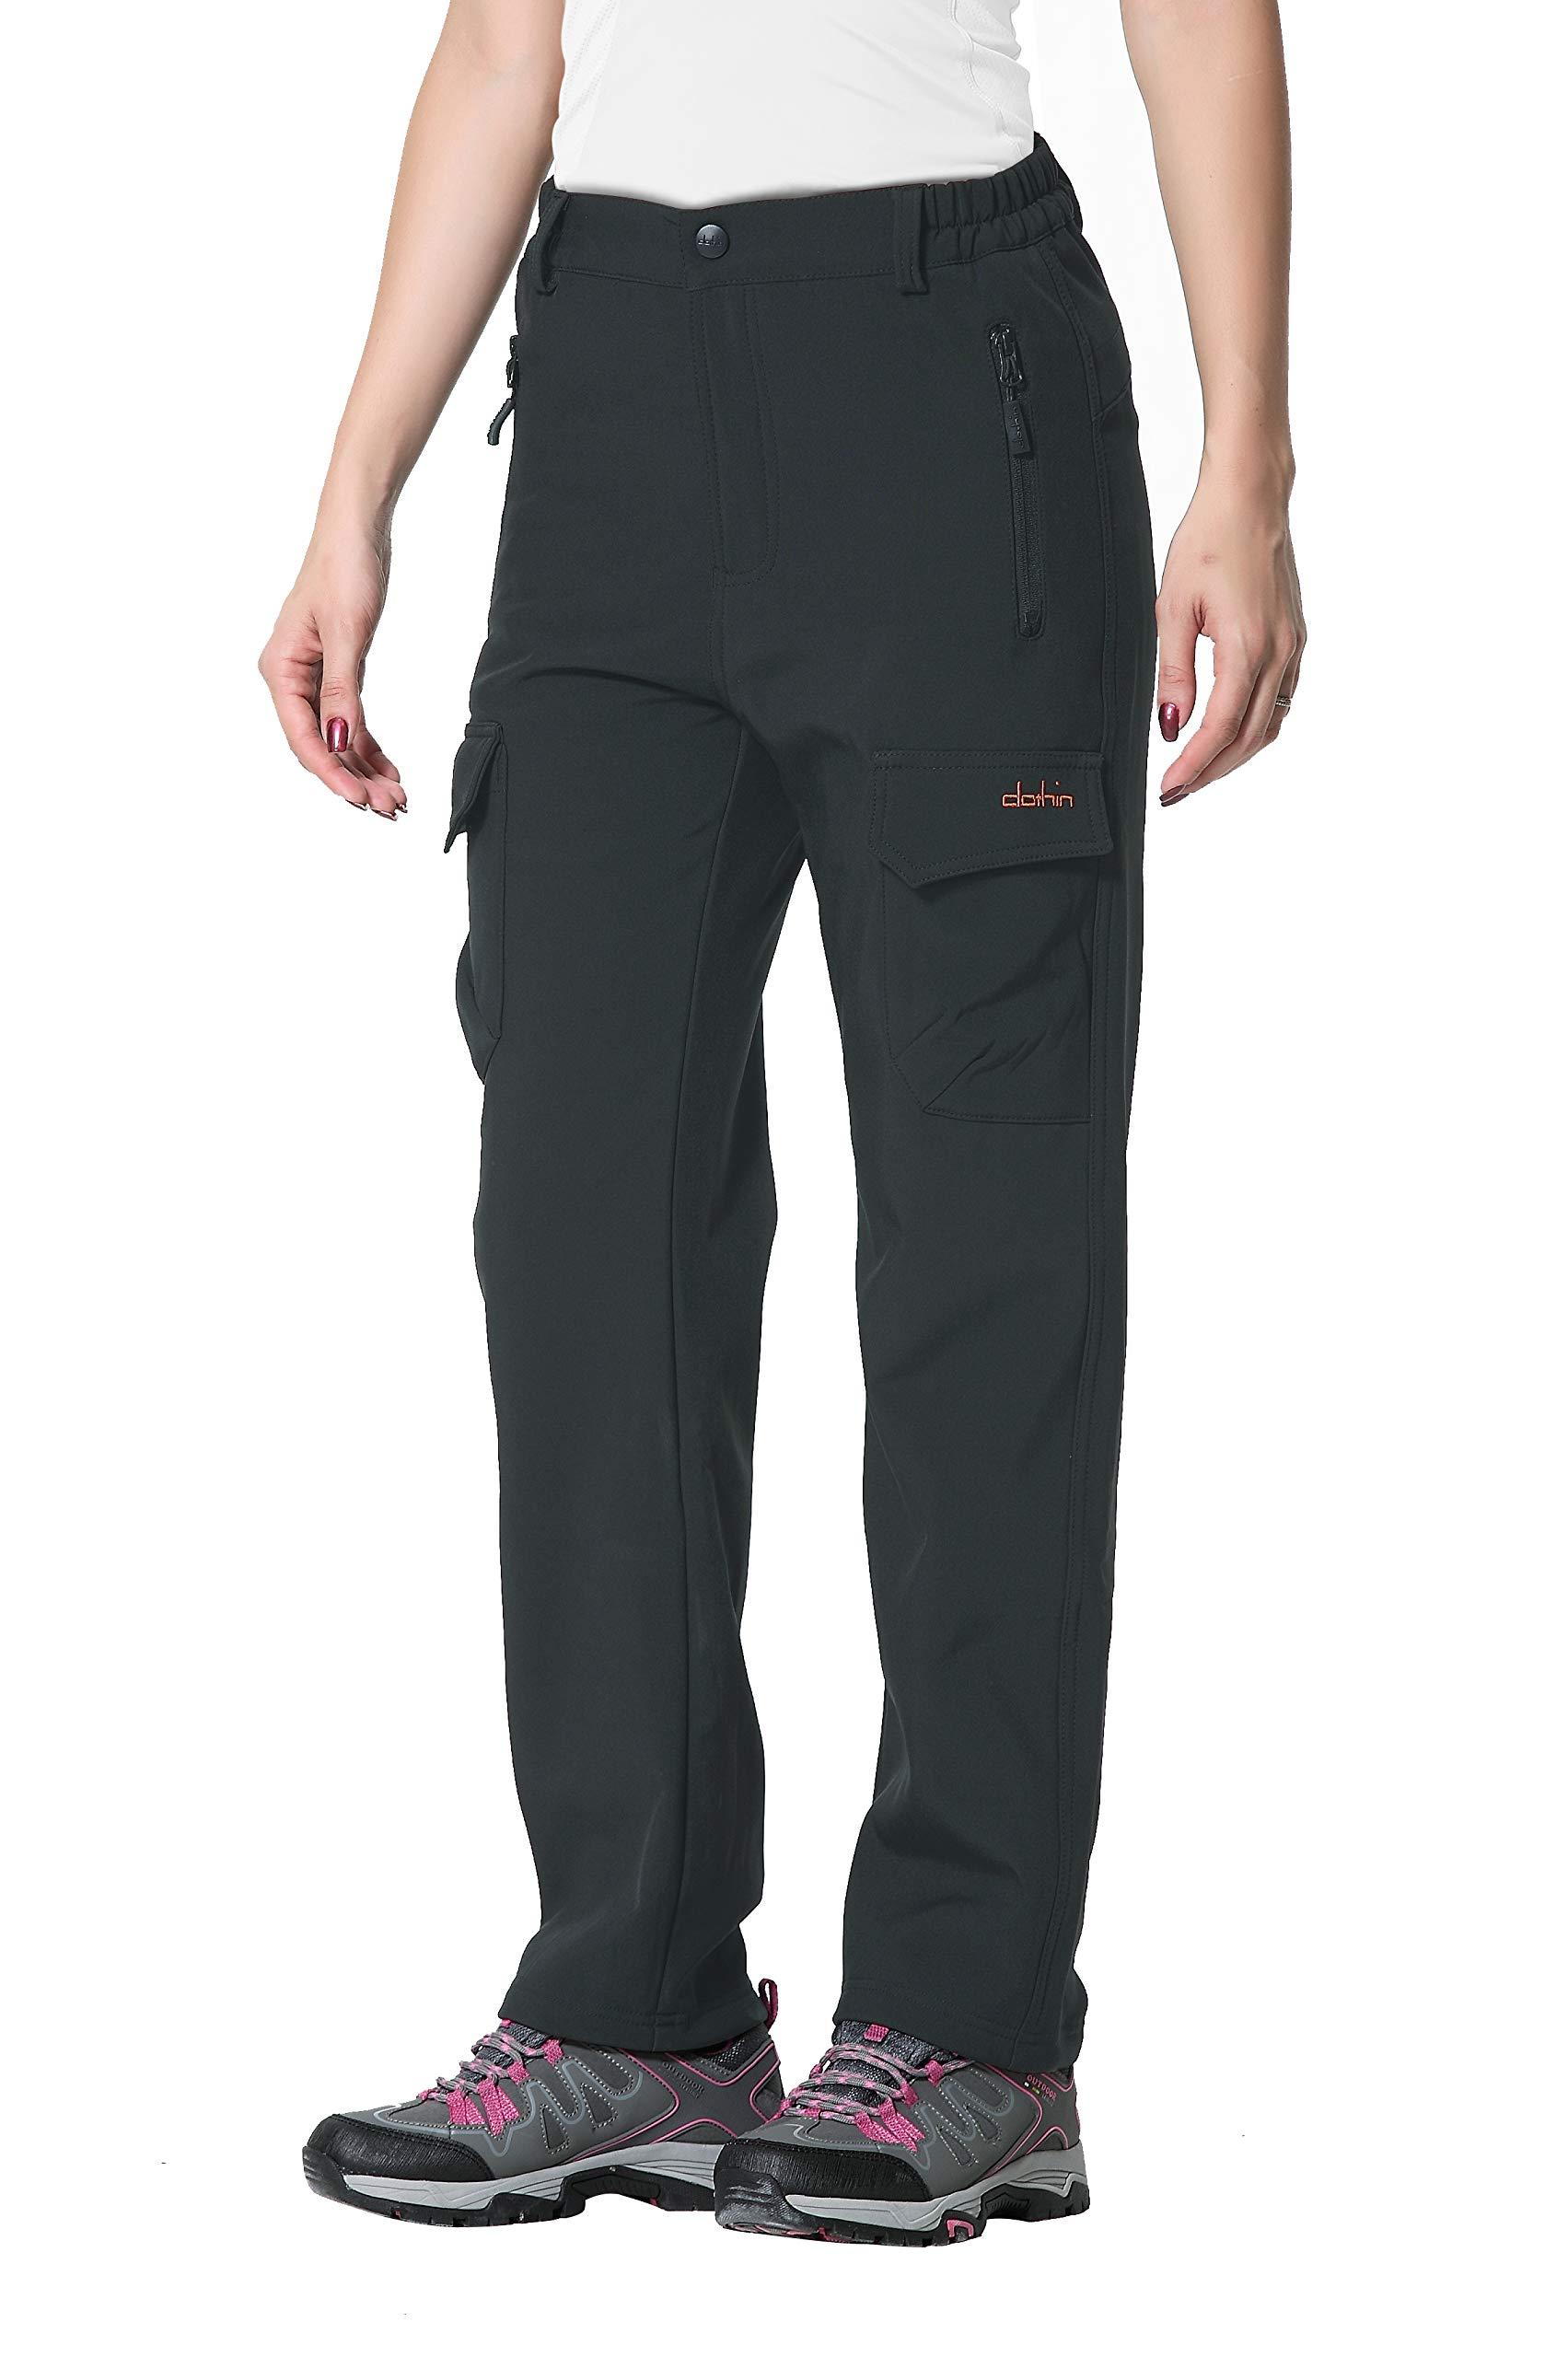 Clothin Women's Fleece Lined Soft Shell Cargo Pants Water Repellent, Wind Resistant